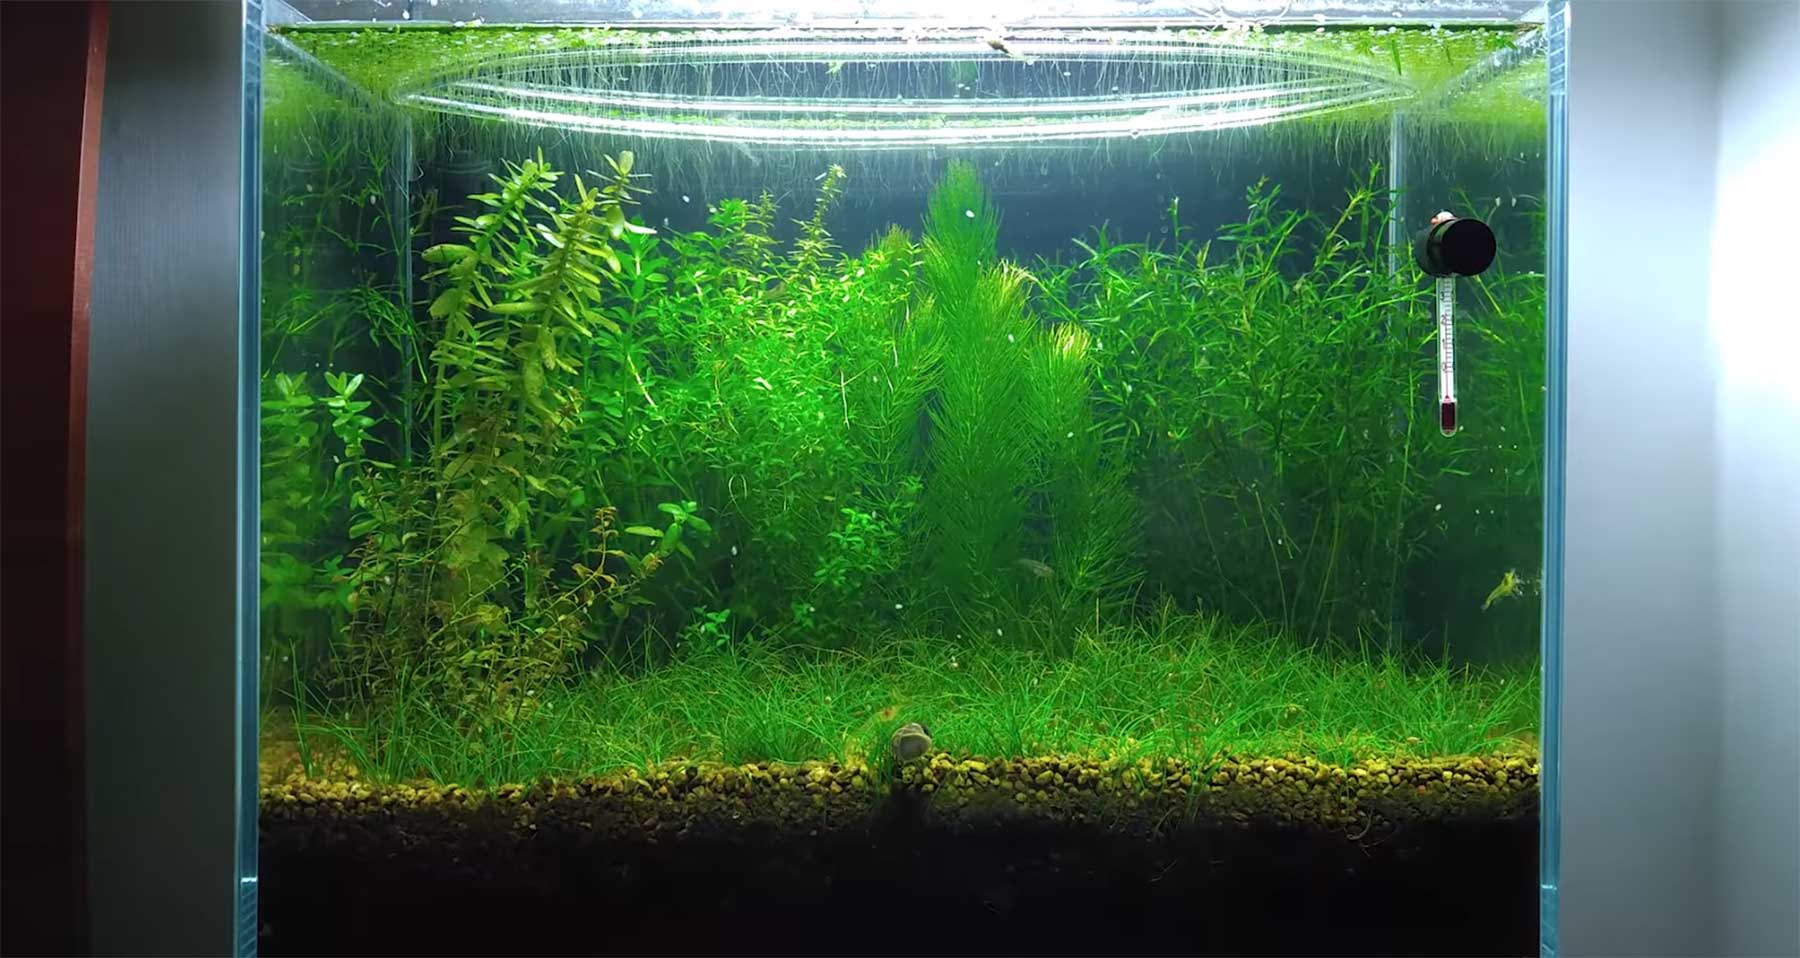 Aquarium sechs Monate ohne Pumpe und Filter stehen lassen Aquarium-Walstad-Methode